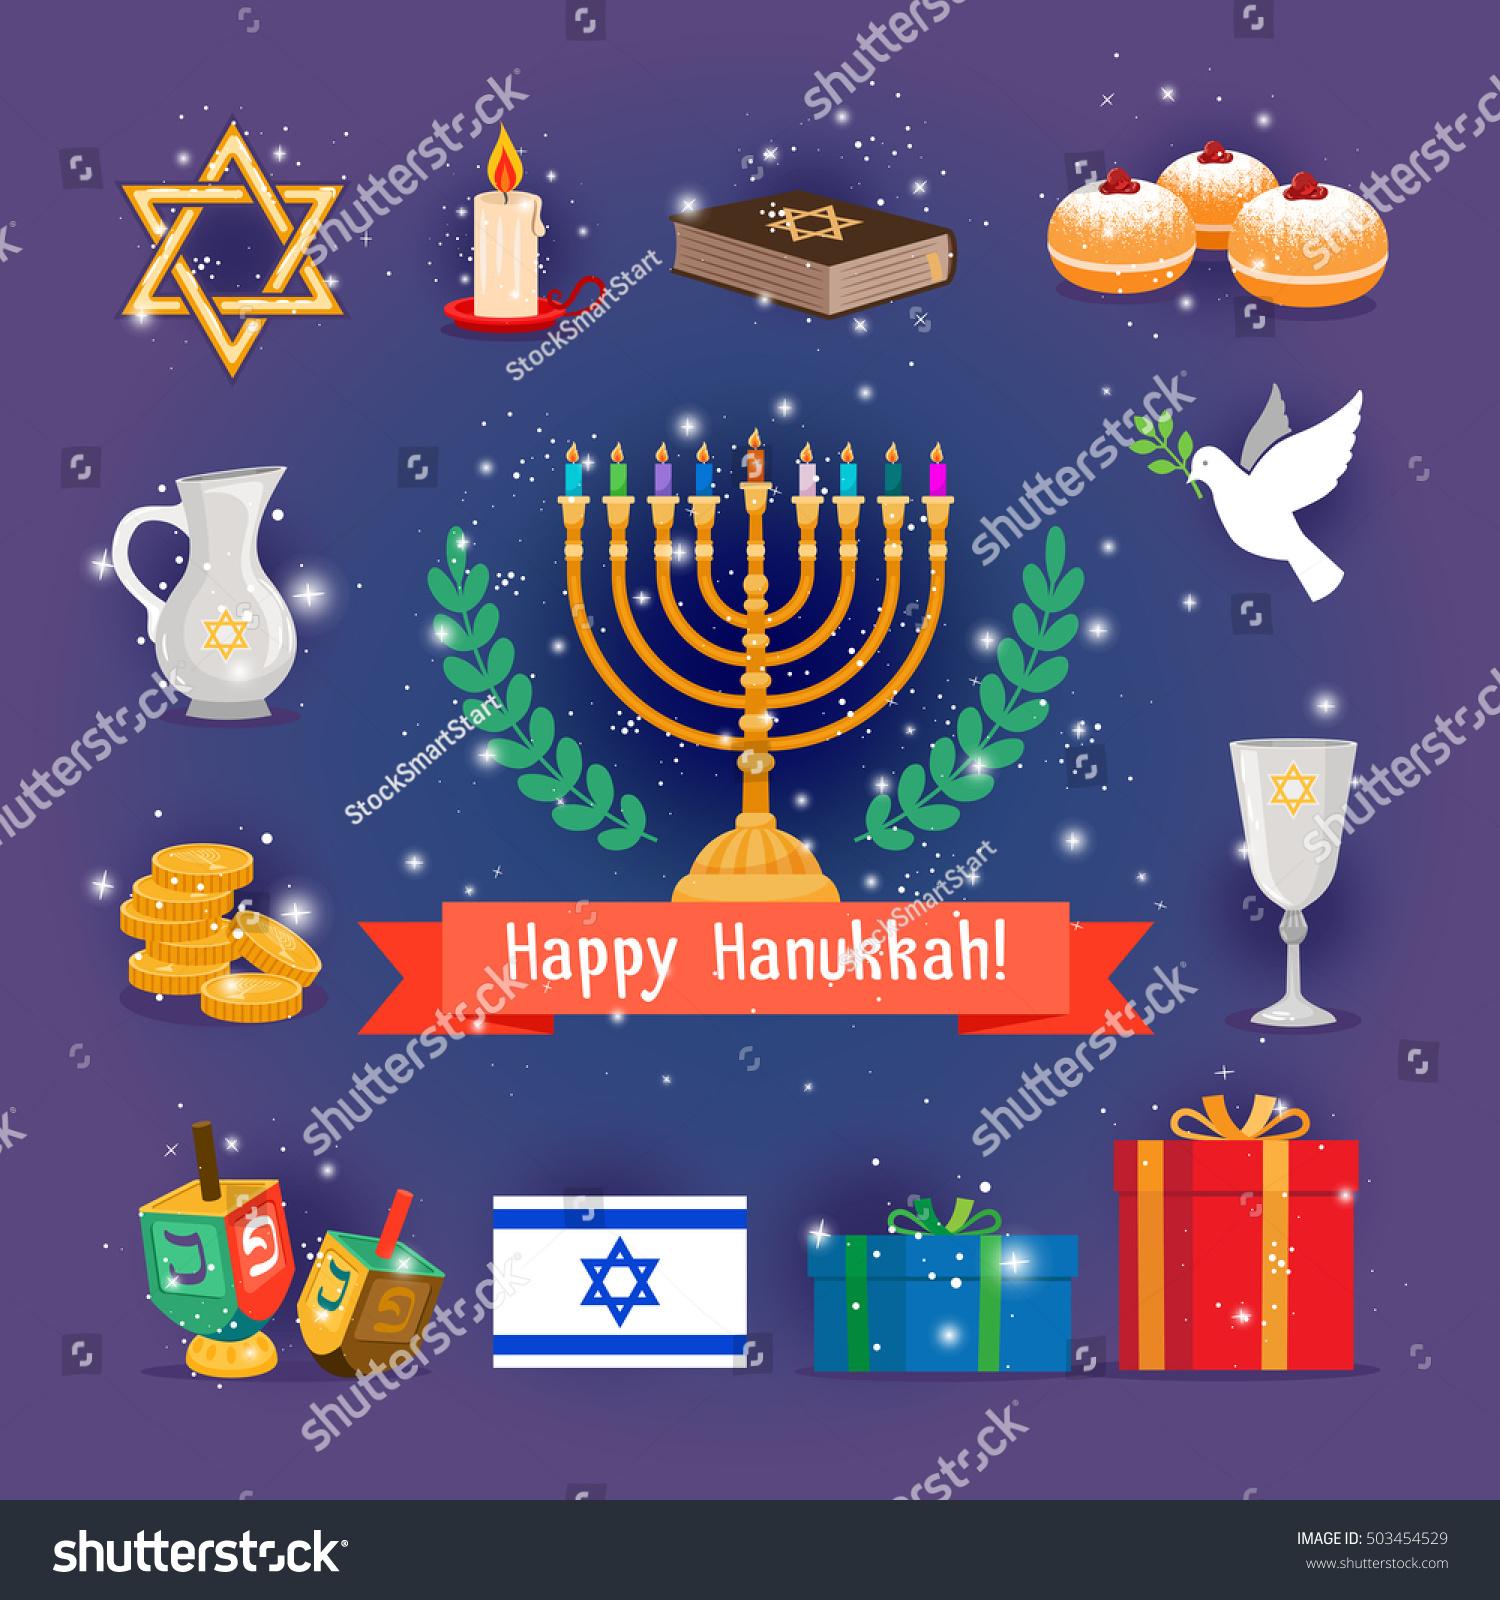 Similar Images Stock Photos Vectors Of Jewish Holidays Hanukkah